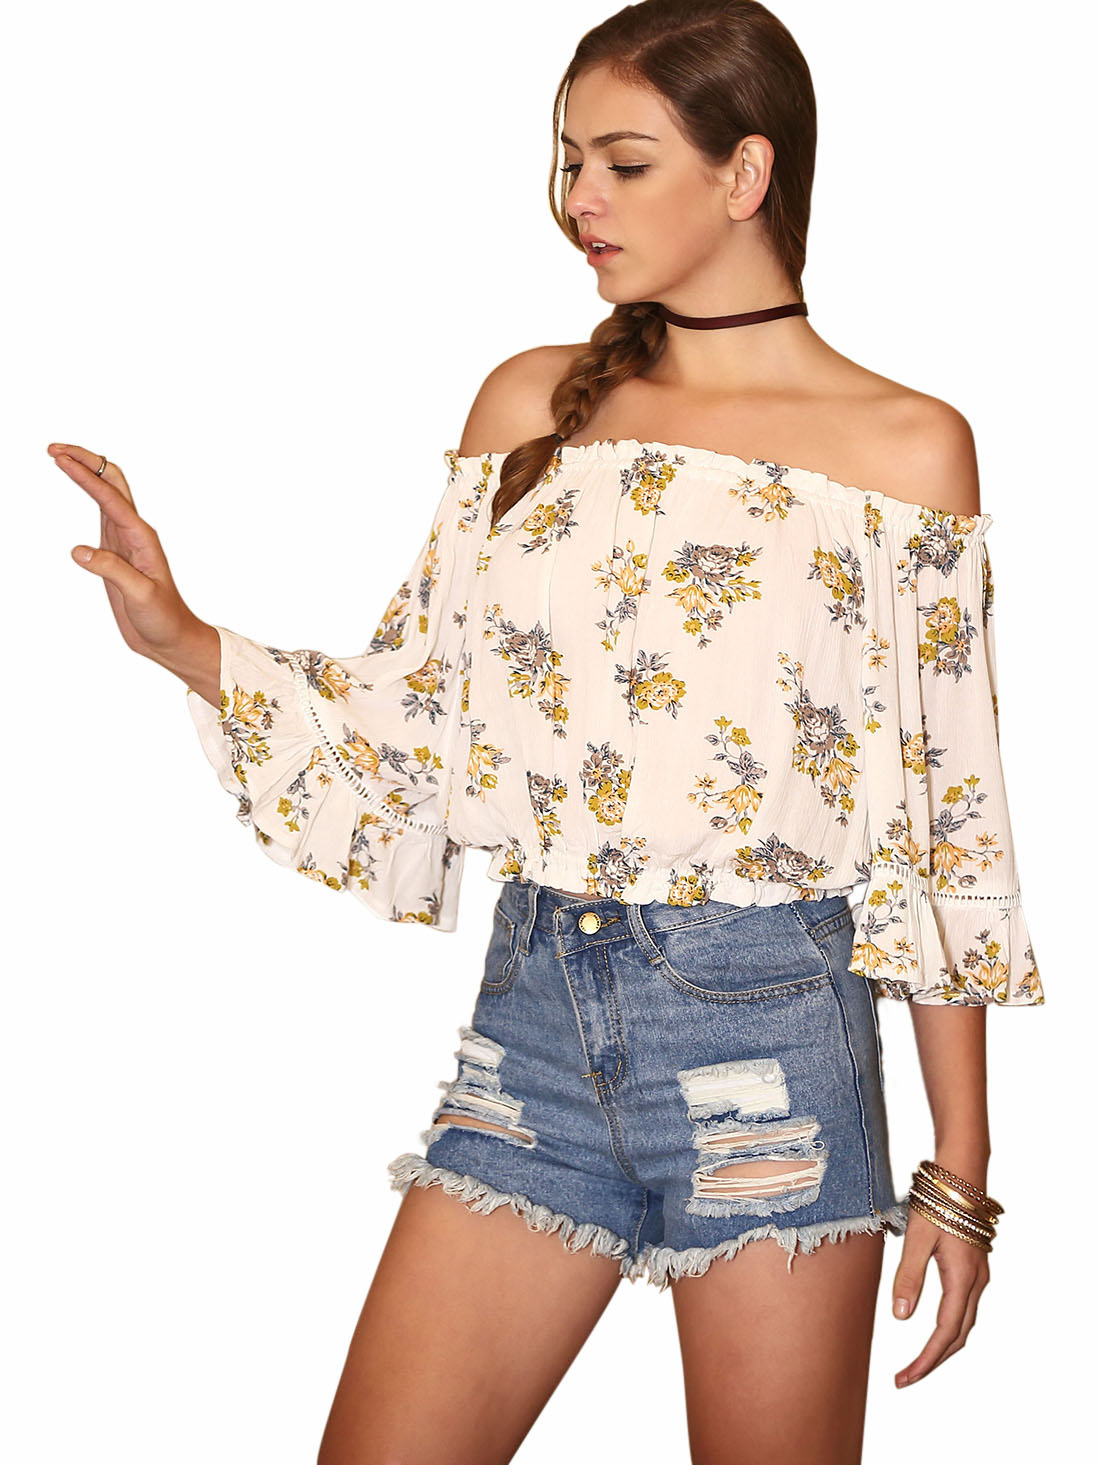 5da5b77724d14a find it at https   www.amazon.com Floerns-Womens-Off-shoulder-Floral-Blouse  dp B01HTMWQJY ref